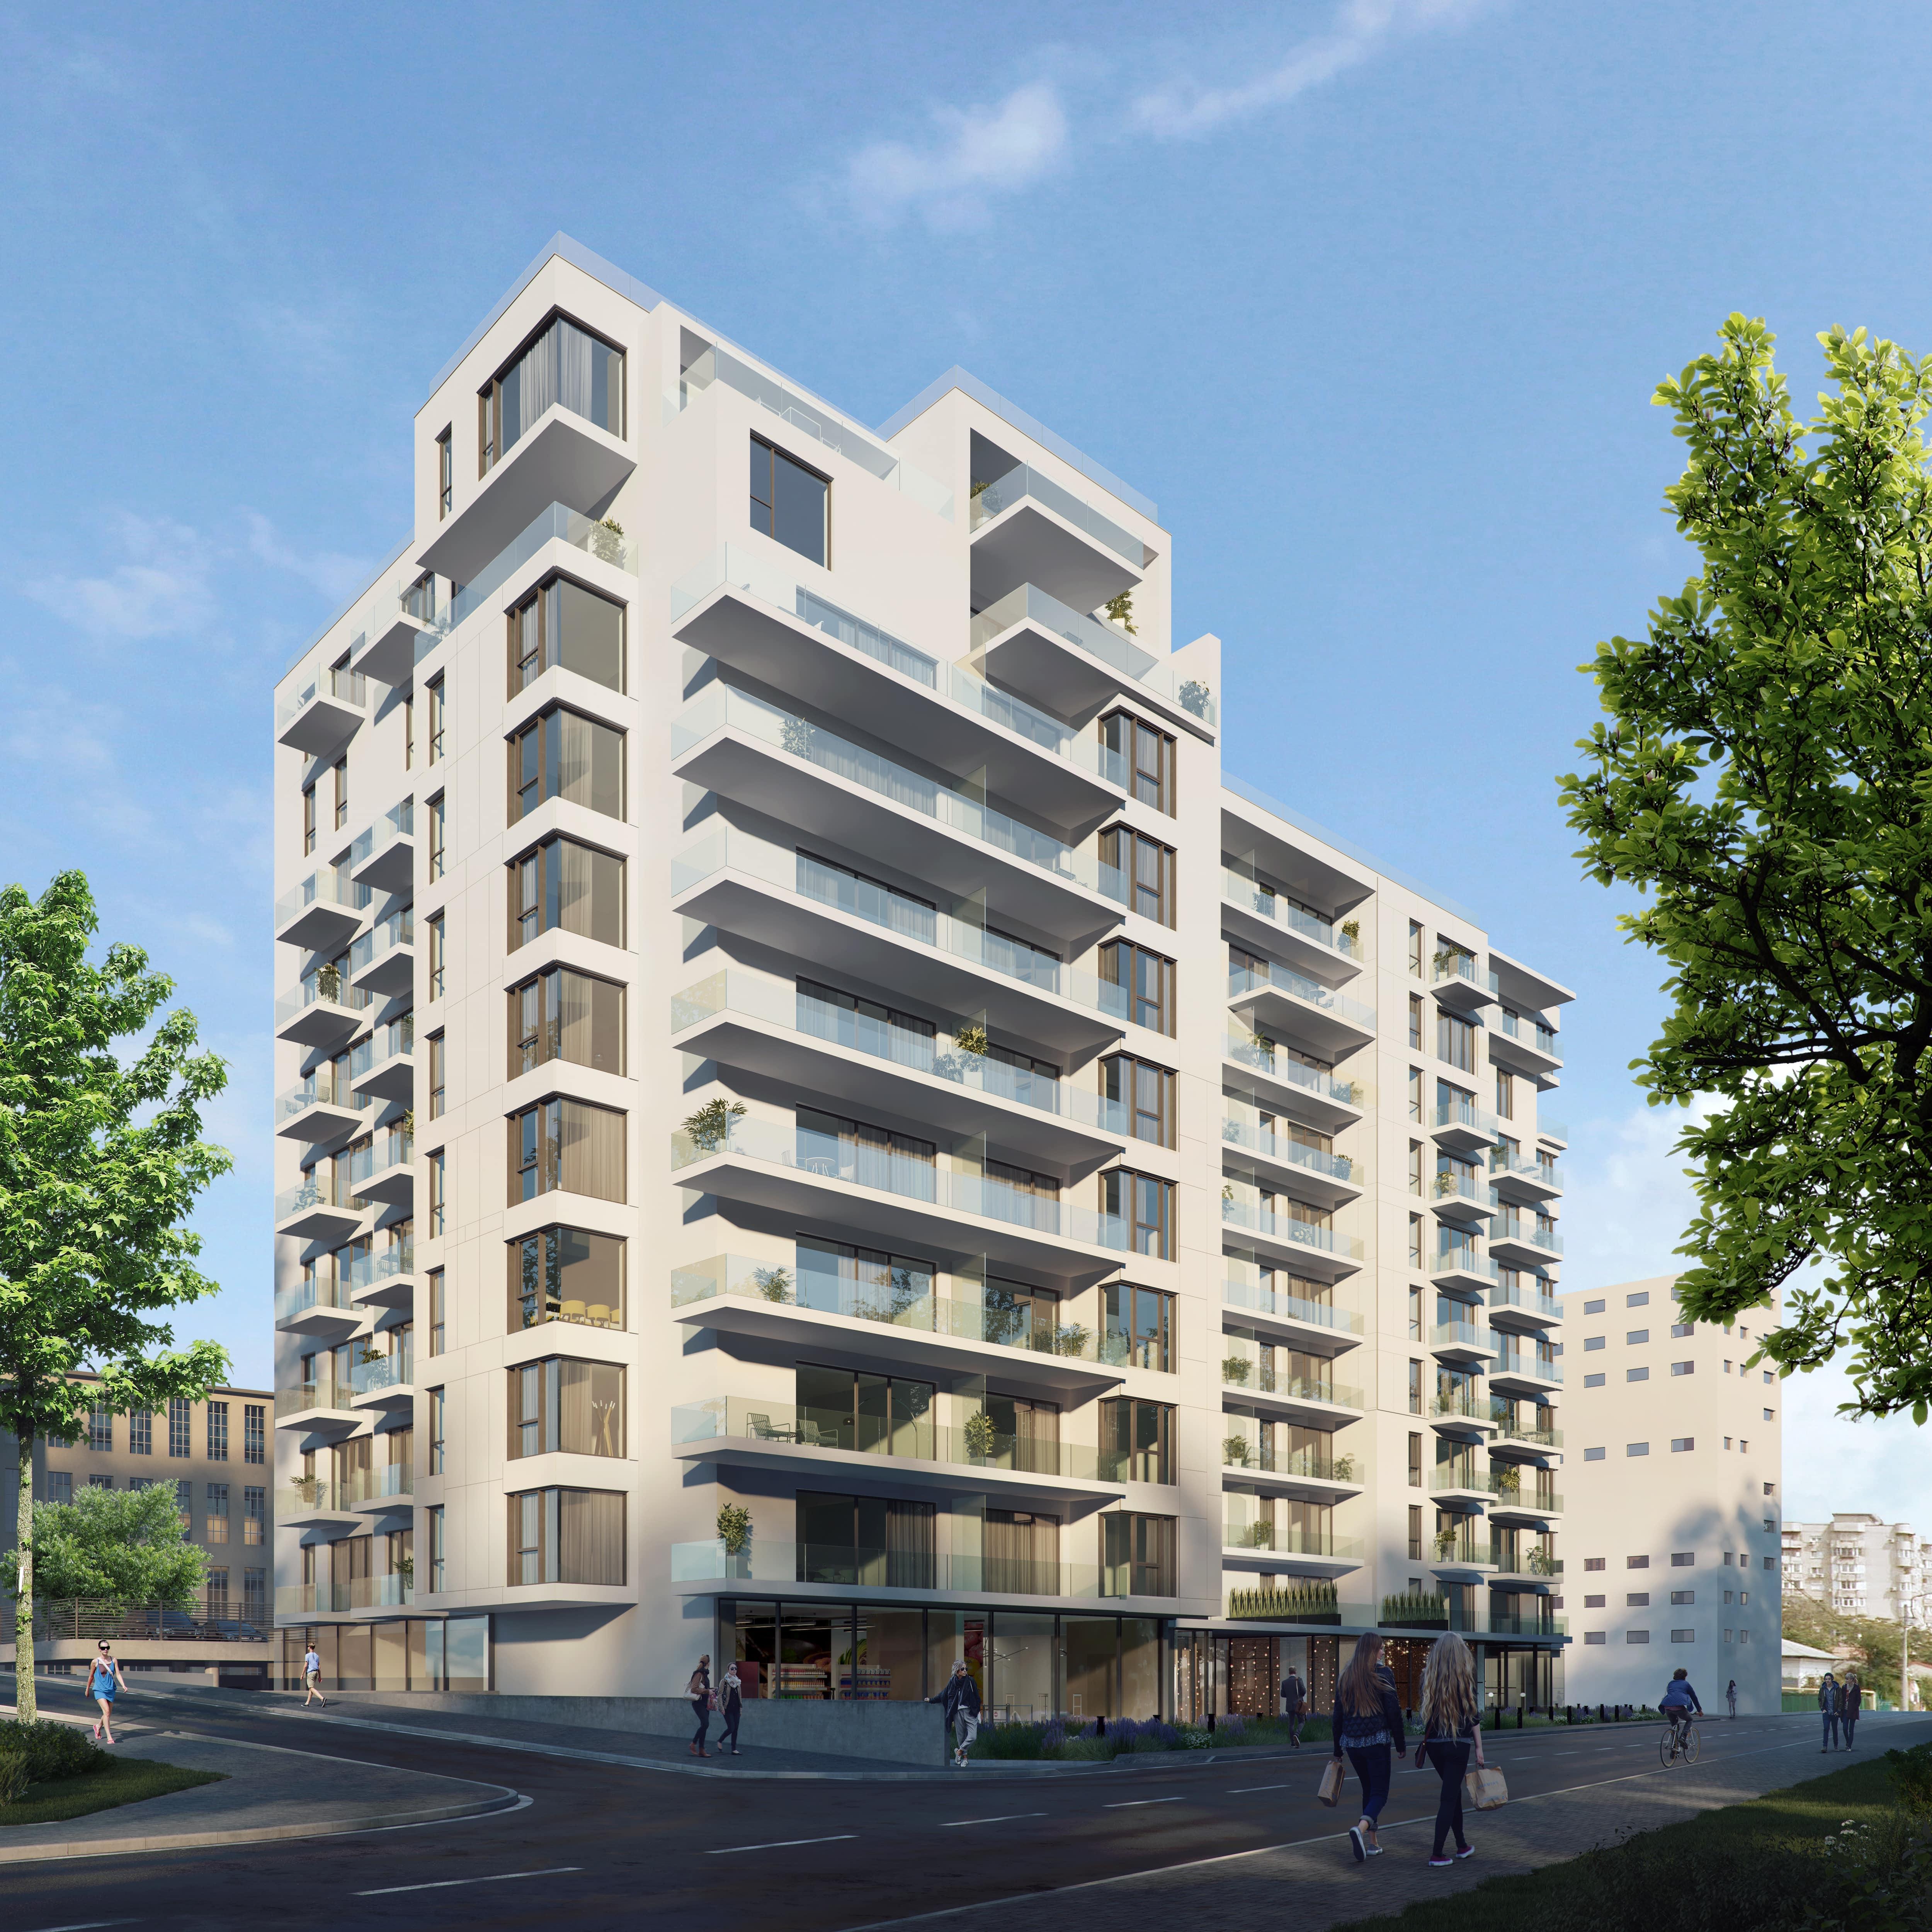 https://ahe-ro.s3.amazonaws.com/8144/penthouse-si-apartamente-unirii-%286%29.jpg